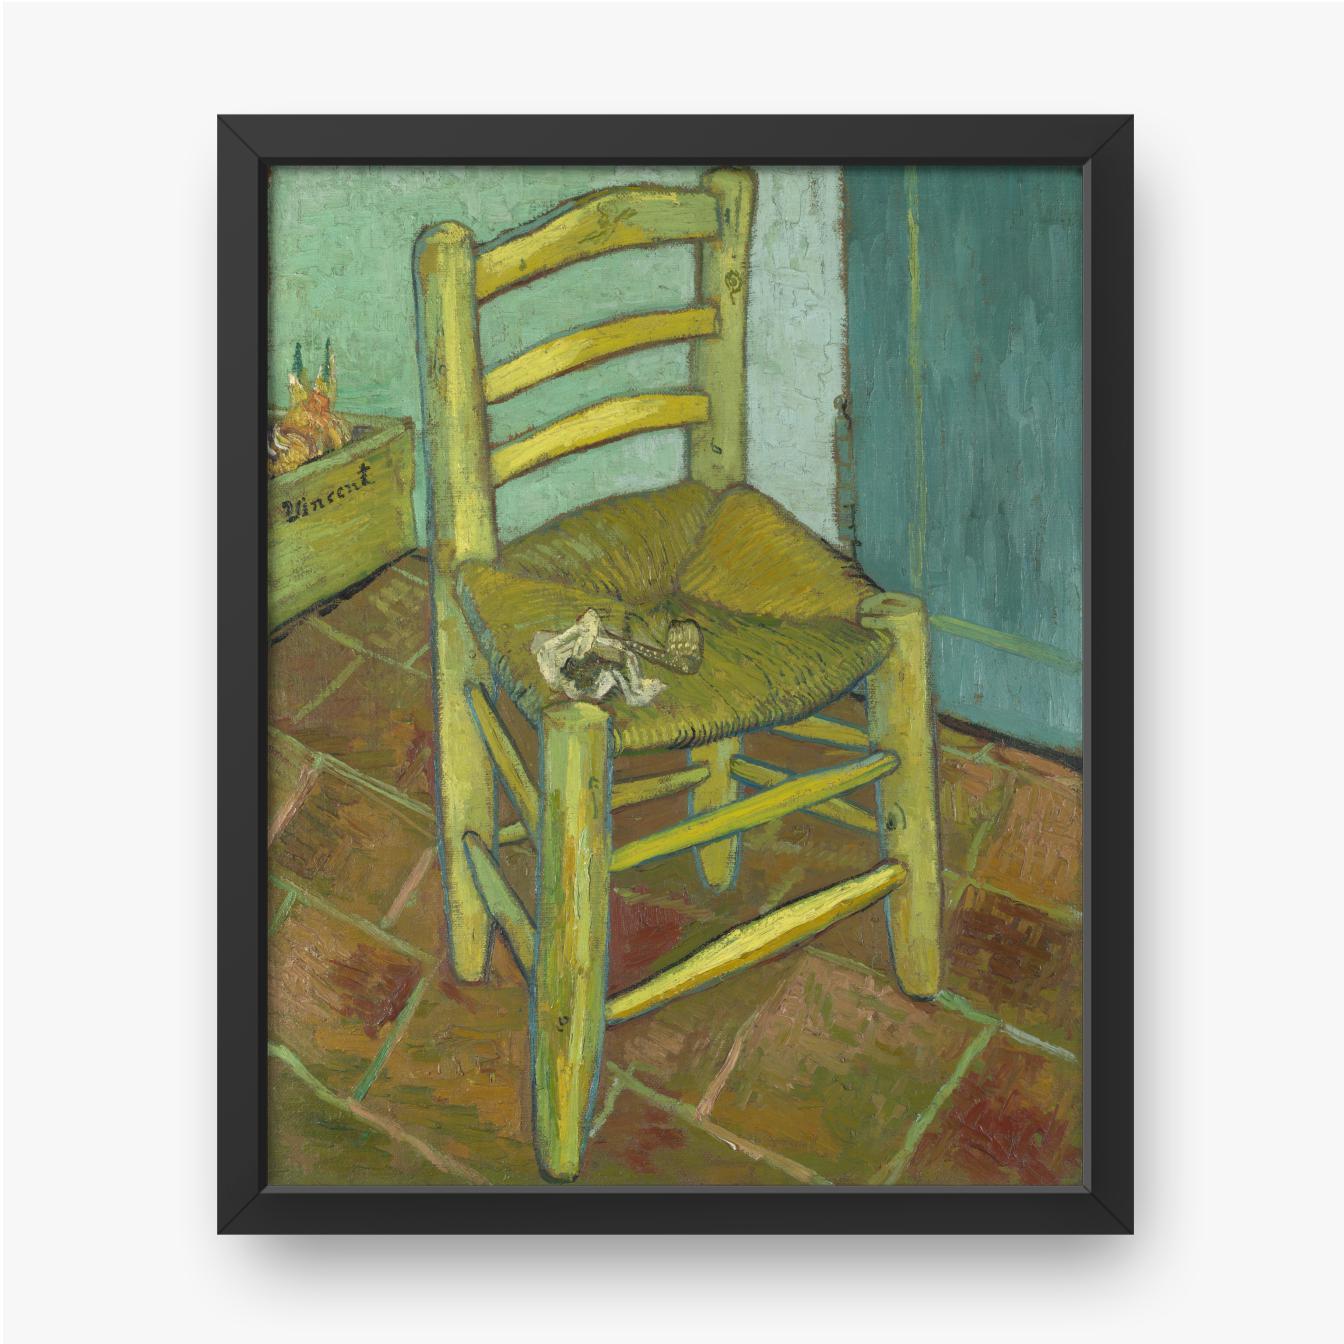 Vincent van Gogh, Vorsitzender, 1888